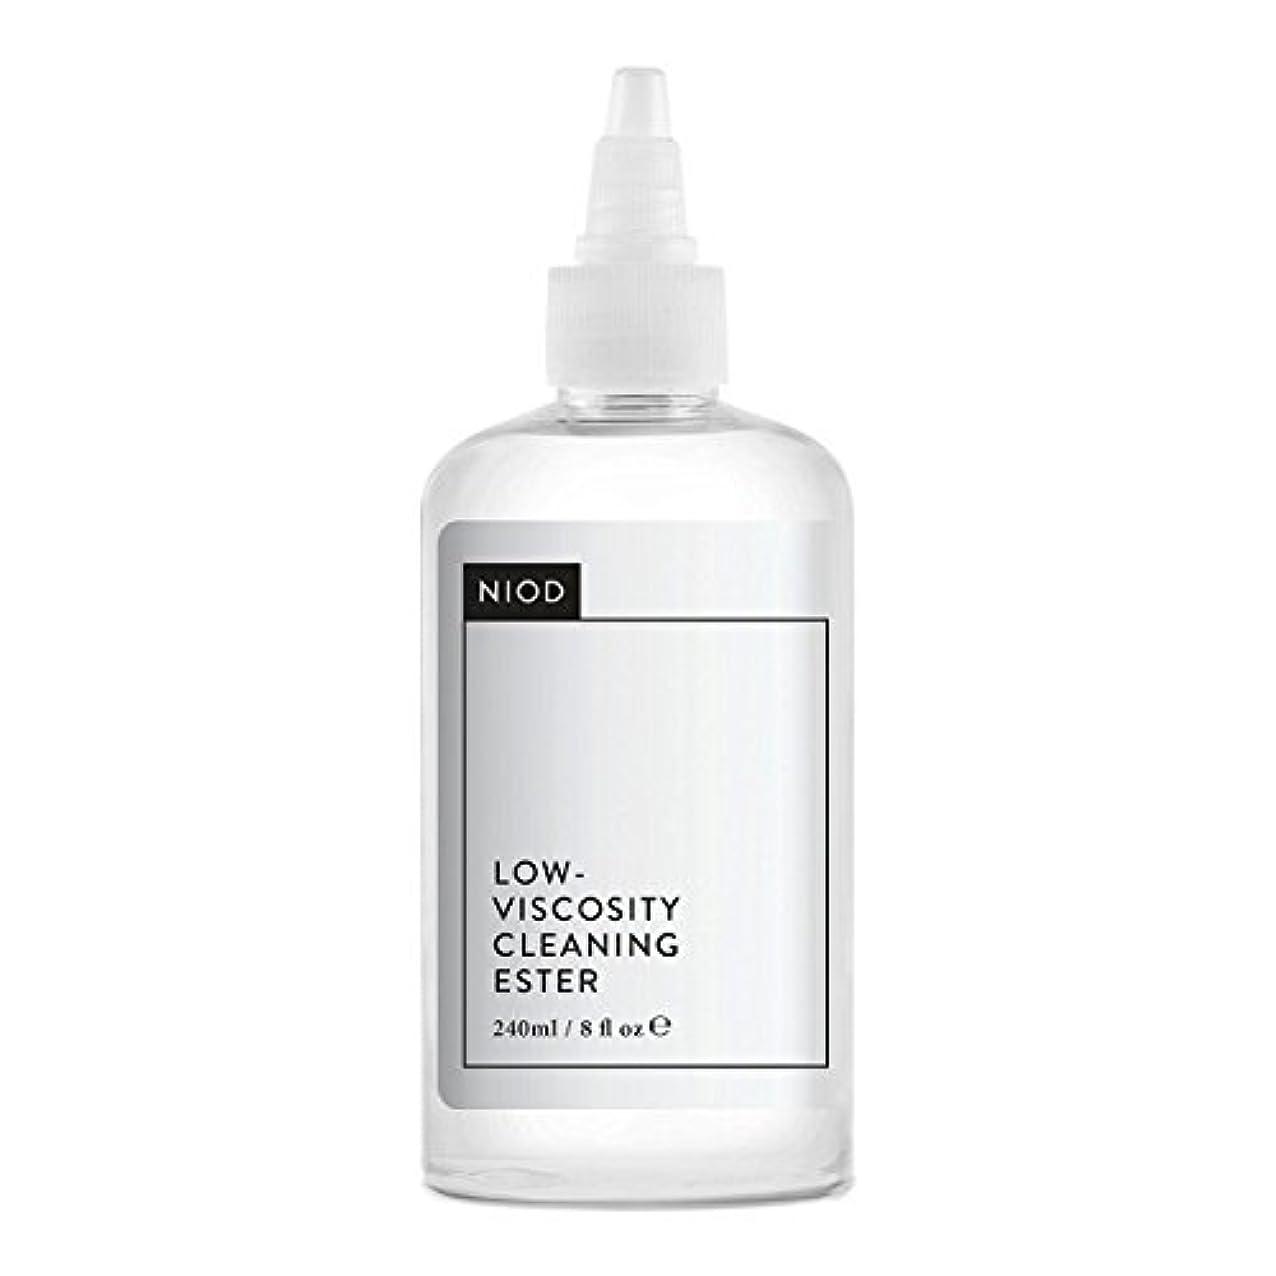 浸漬罰等Niod Low-viscosity Cleaning Ester 240ml [並行輸入品]